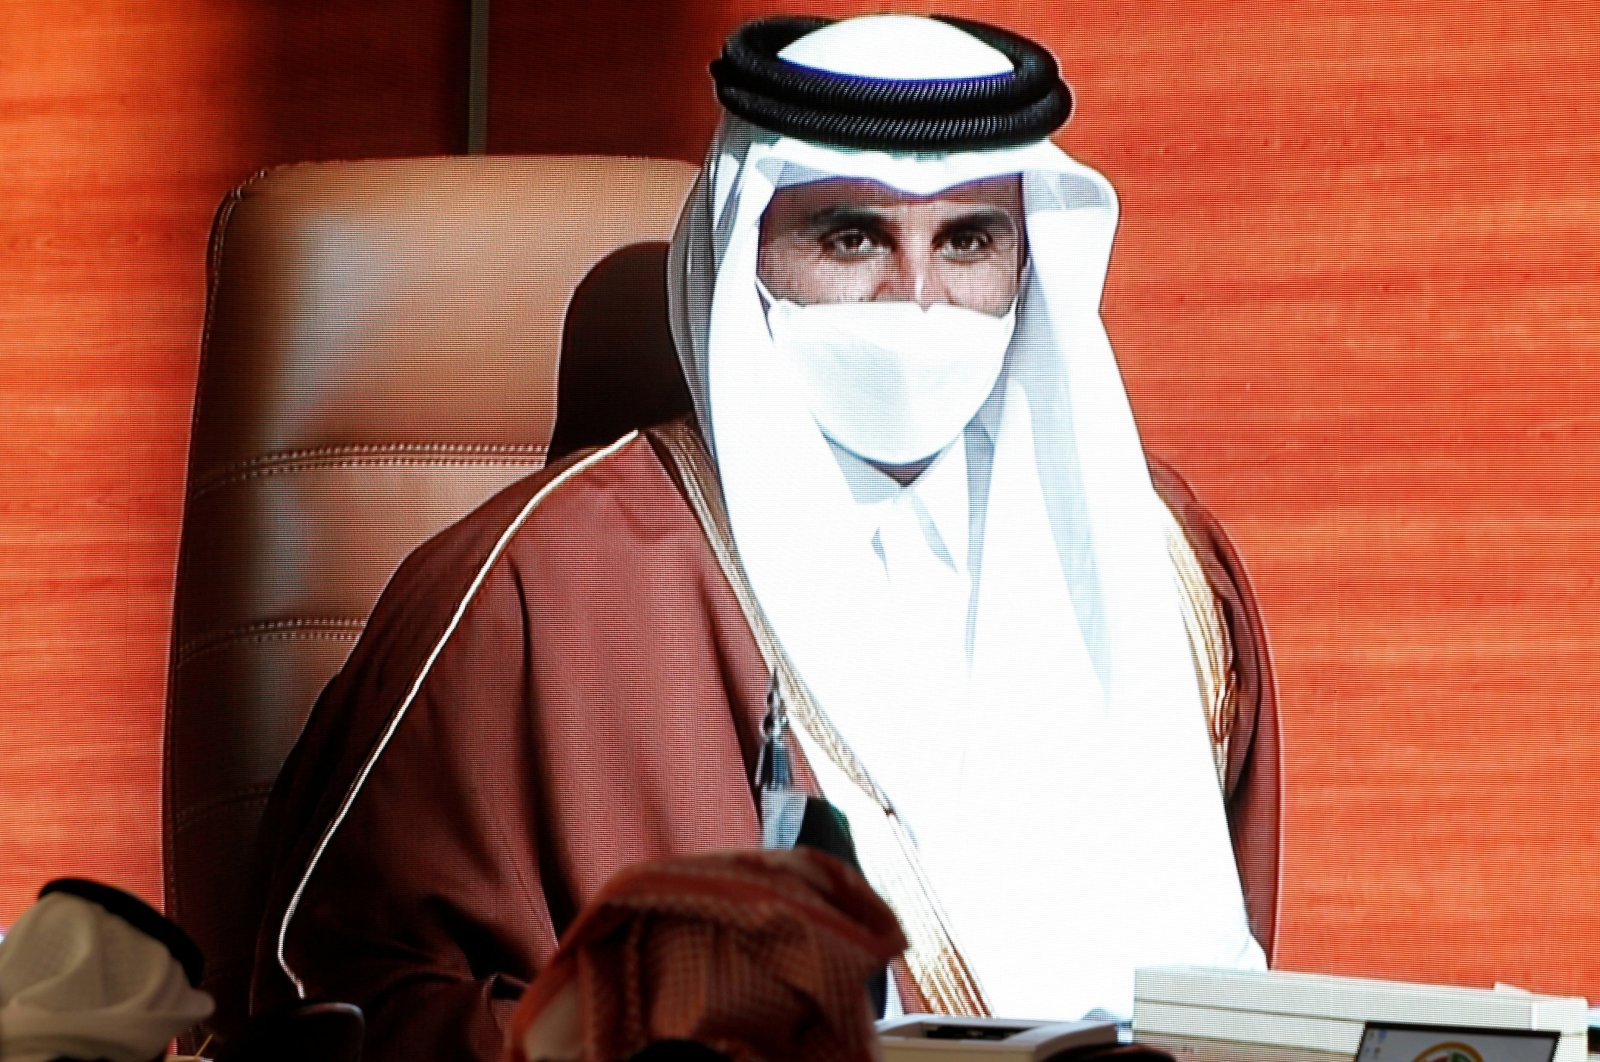 Qatar's Emir Sheikh Tamim bin Hamad Al Thani is pictured via screen as he attends the Gulf Cooperation Council's (GCC) 41st Summit, in Al Ula, Saudi Arabia Jan. 5, 2021. (REUTERS Photo)